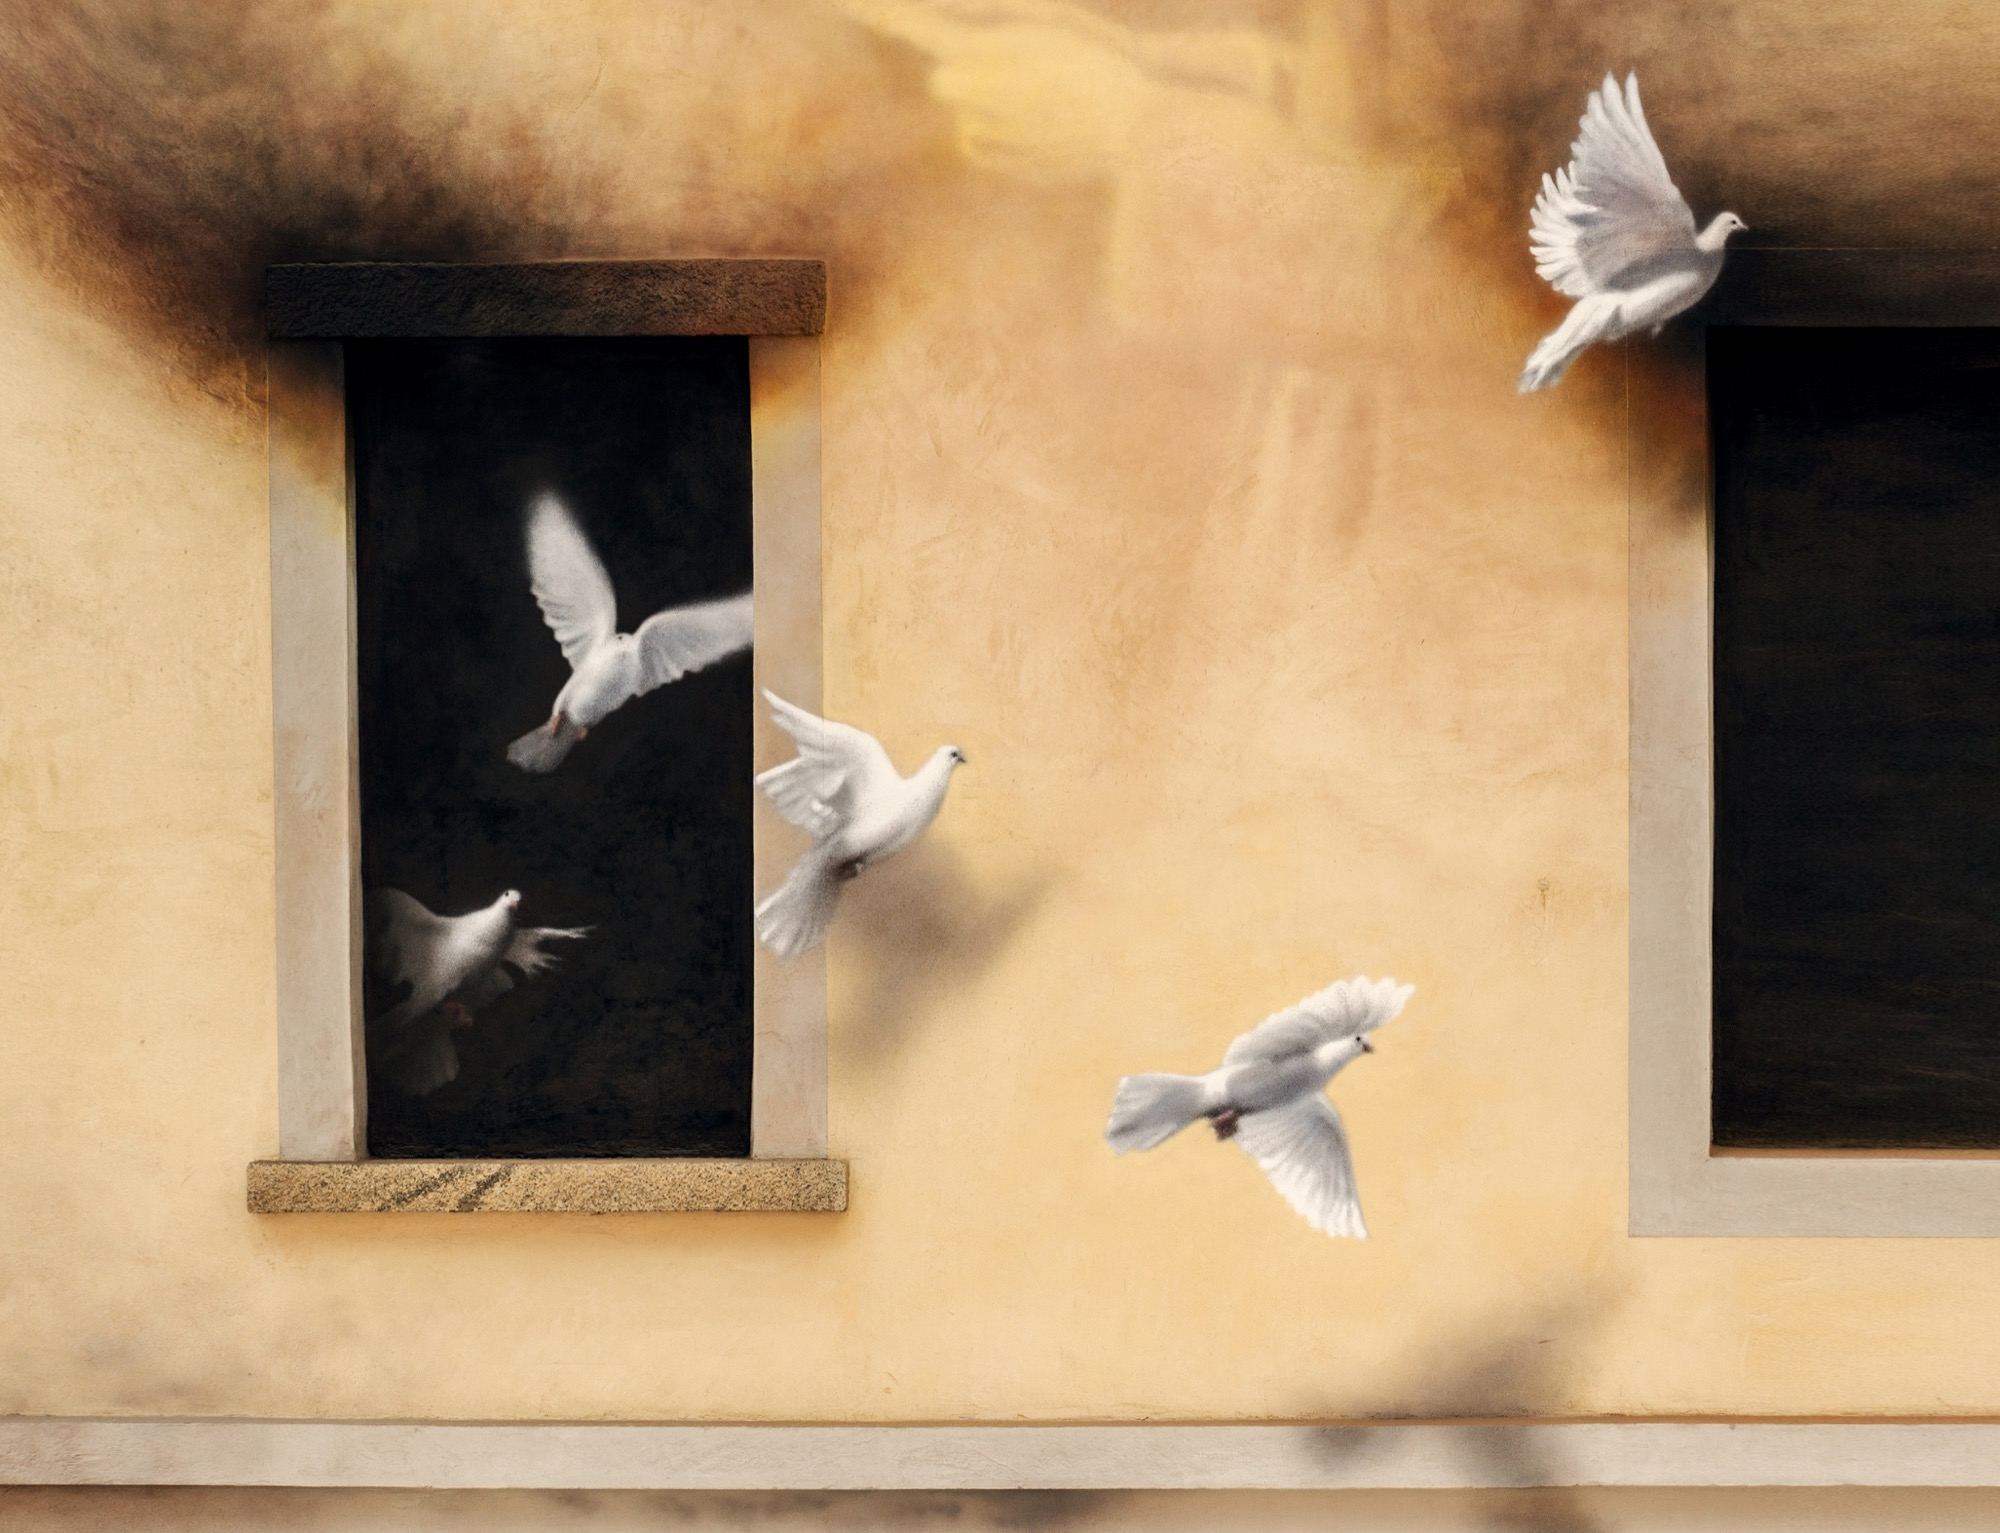 Anti-War Mural by Eron in Cevo, Italy - The Dallas Art Dealers ...